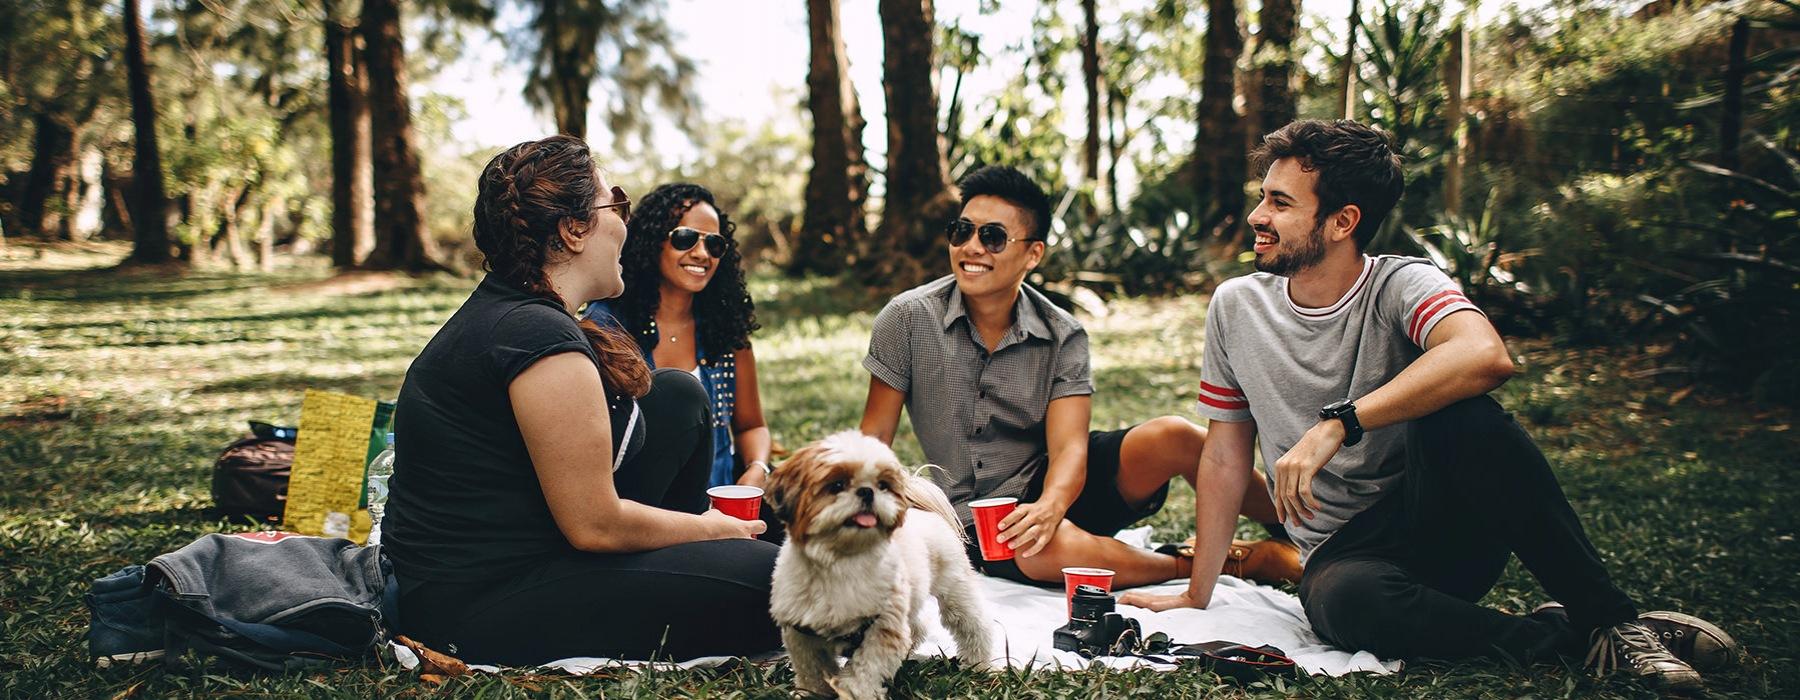 friends at a park